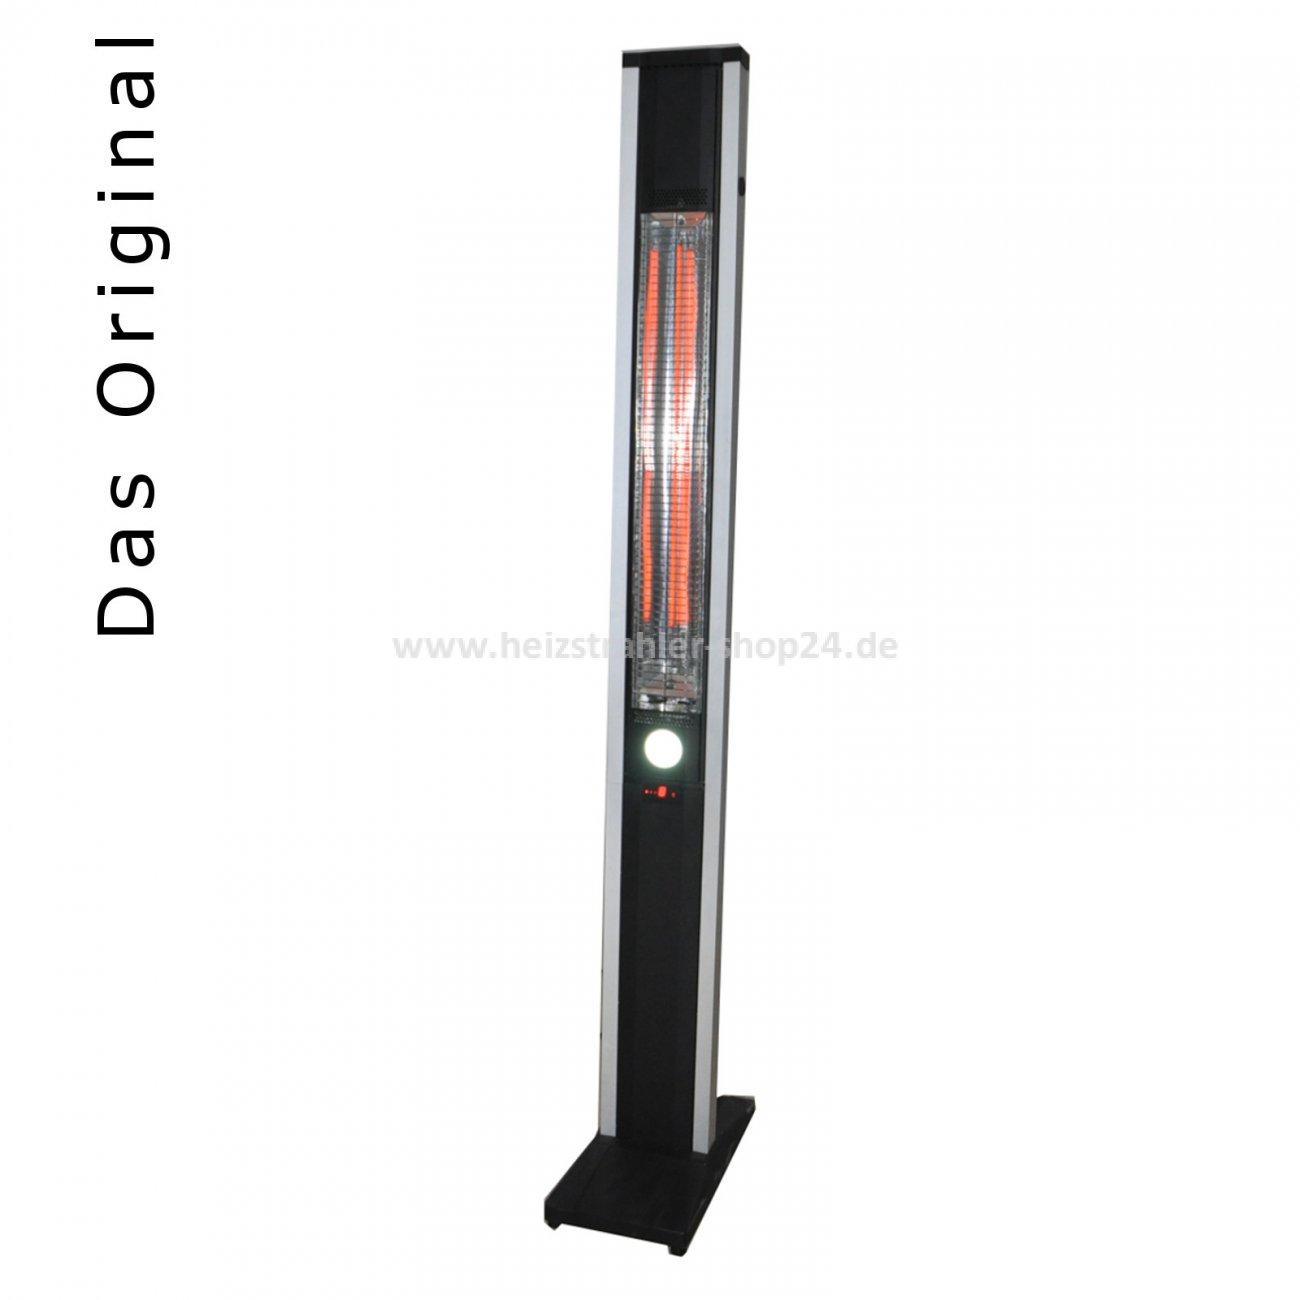 infrarotheizstrahler bali standmodell i heizstrahler shop24. Black Bedroom Furniture Sets. Home Design Ideas